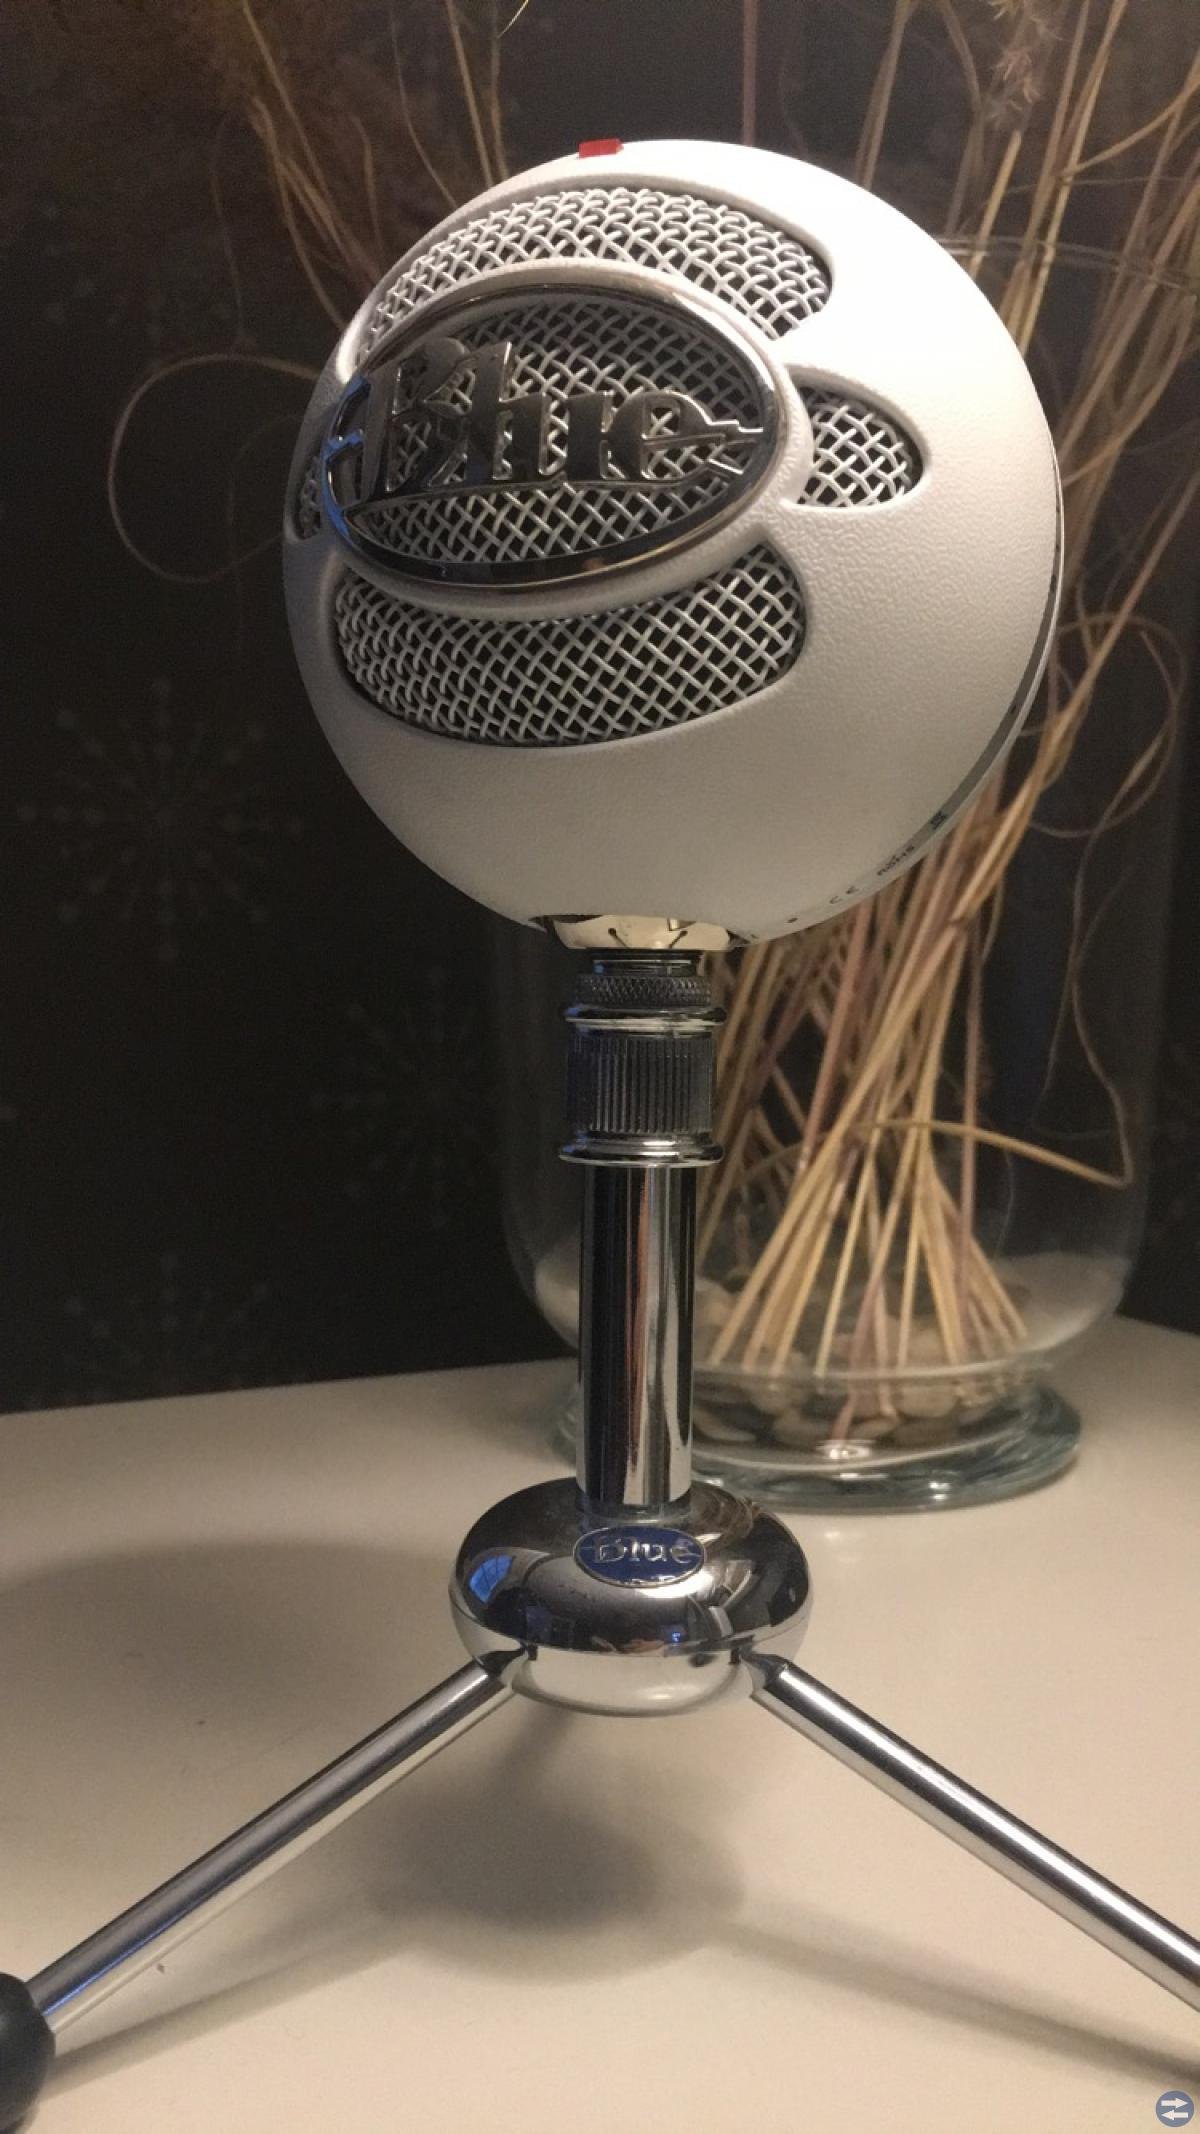 Blue Snowball Vit (Mikrofon)